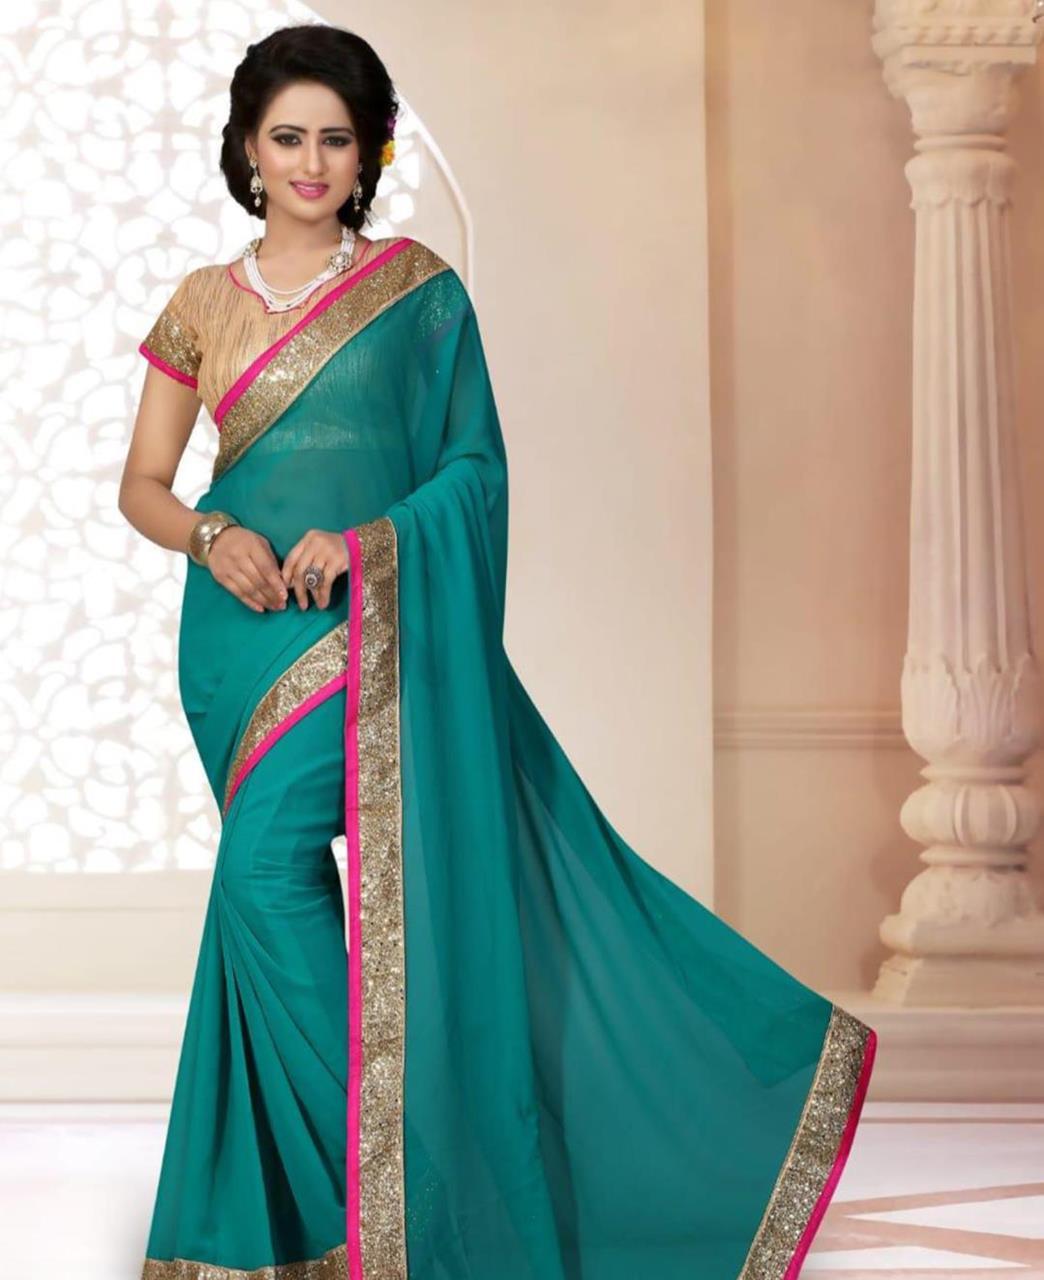 Lace Georgette Saree (Sari) in SKYBLUE